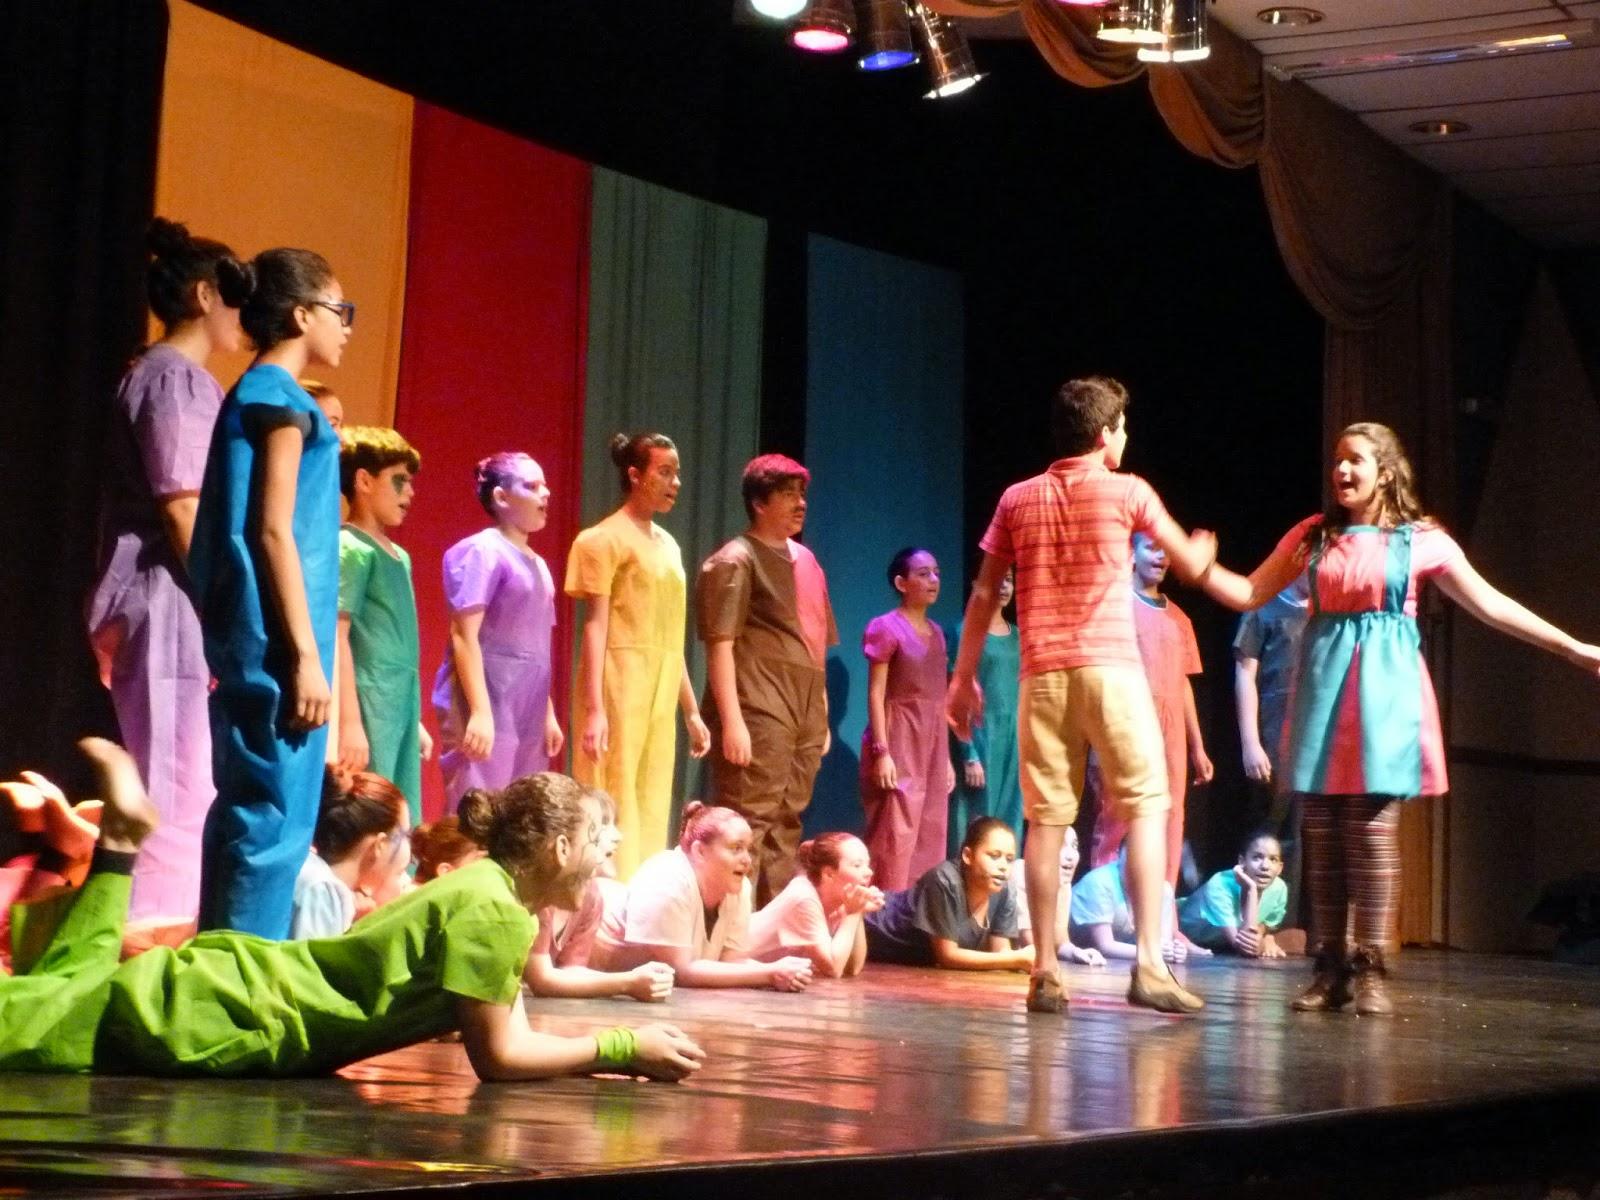 Grupo de teatro adolescente south florida